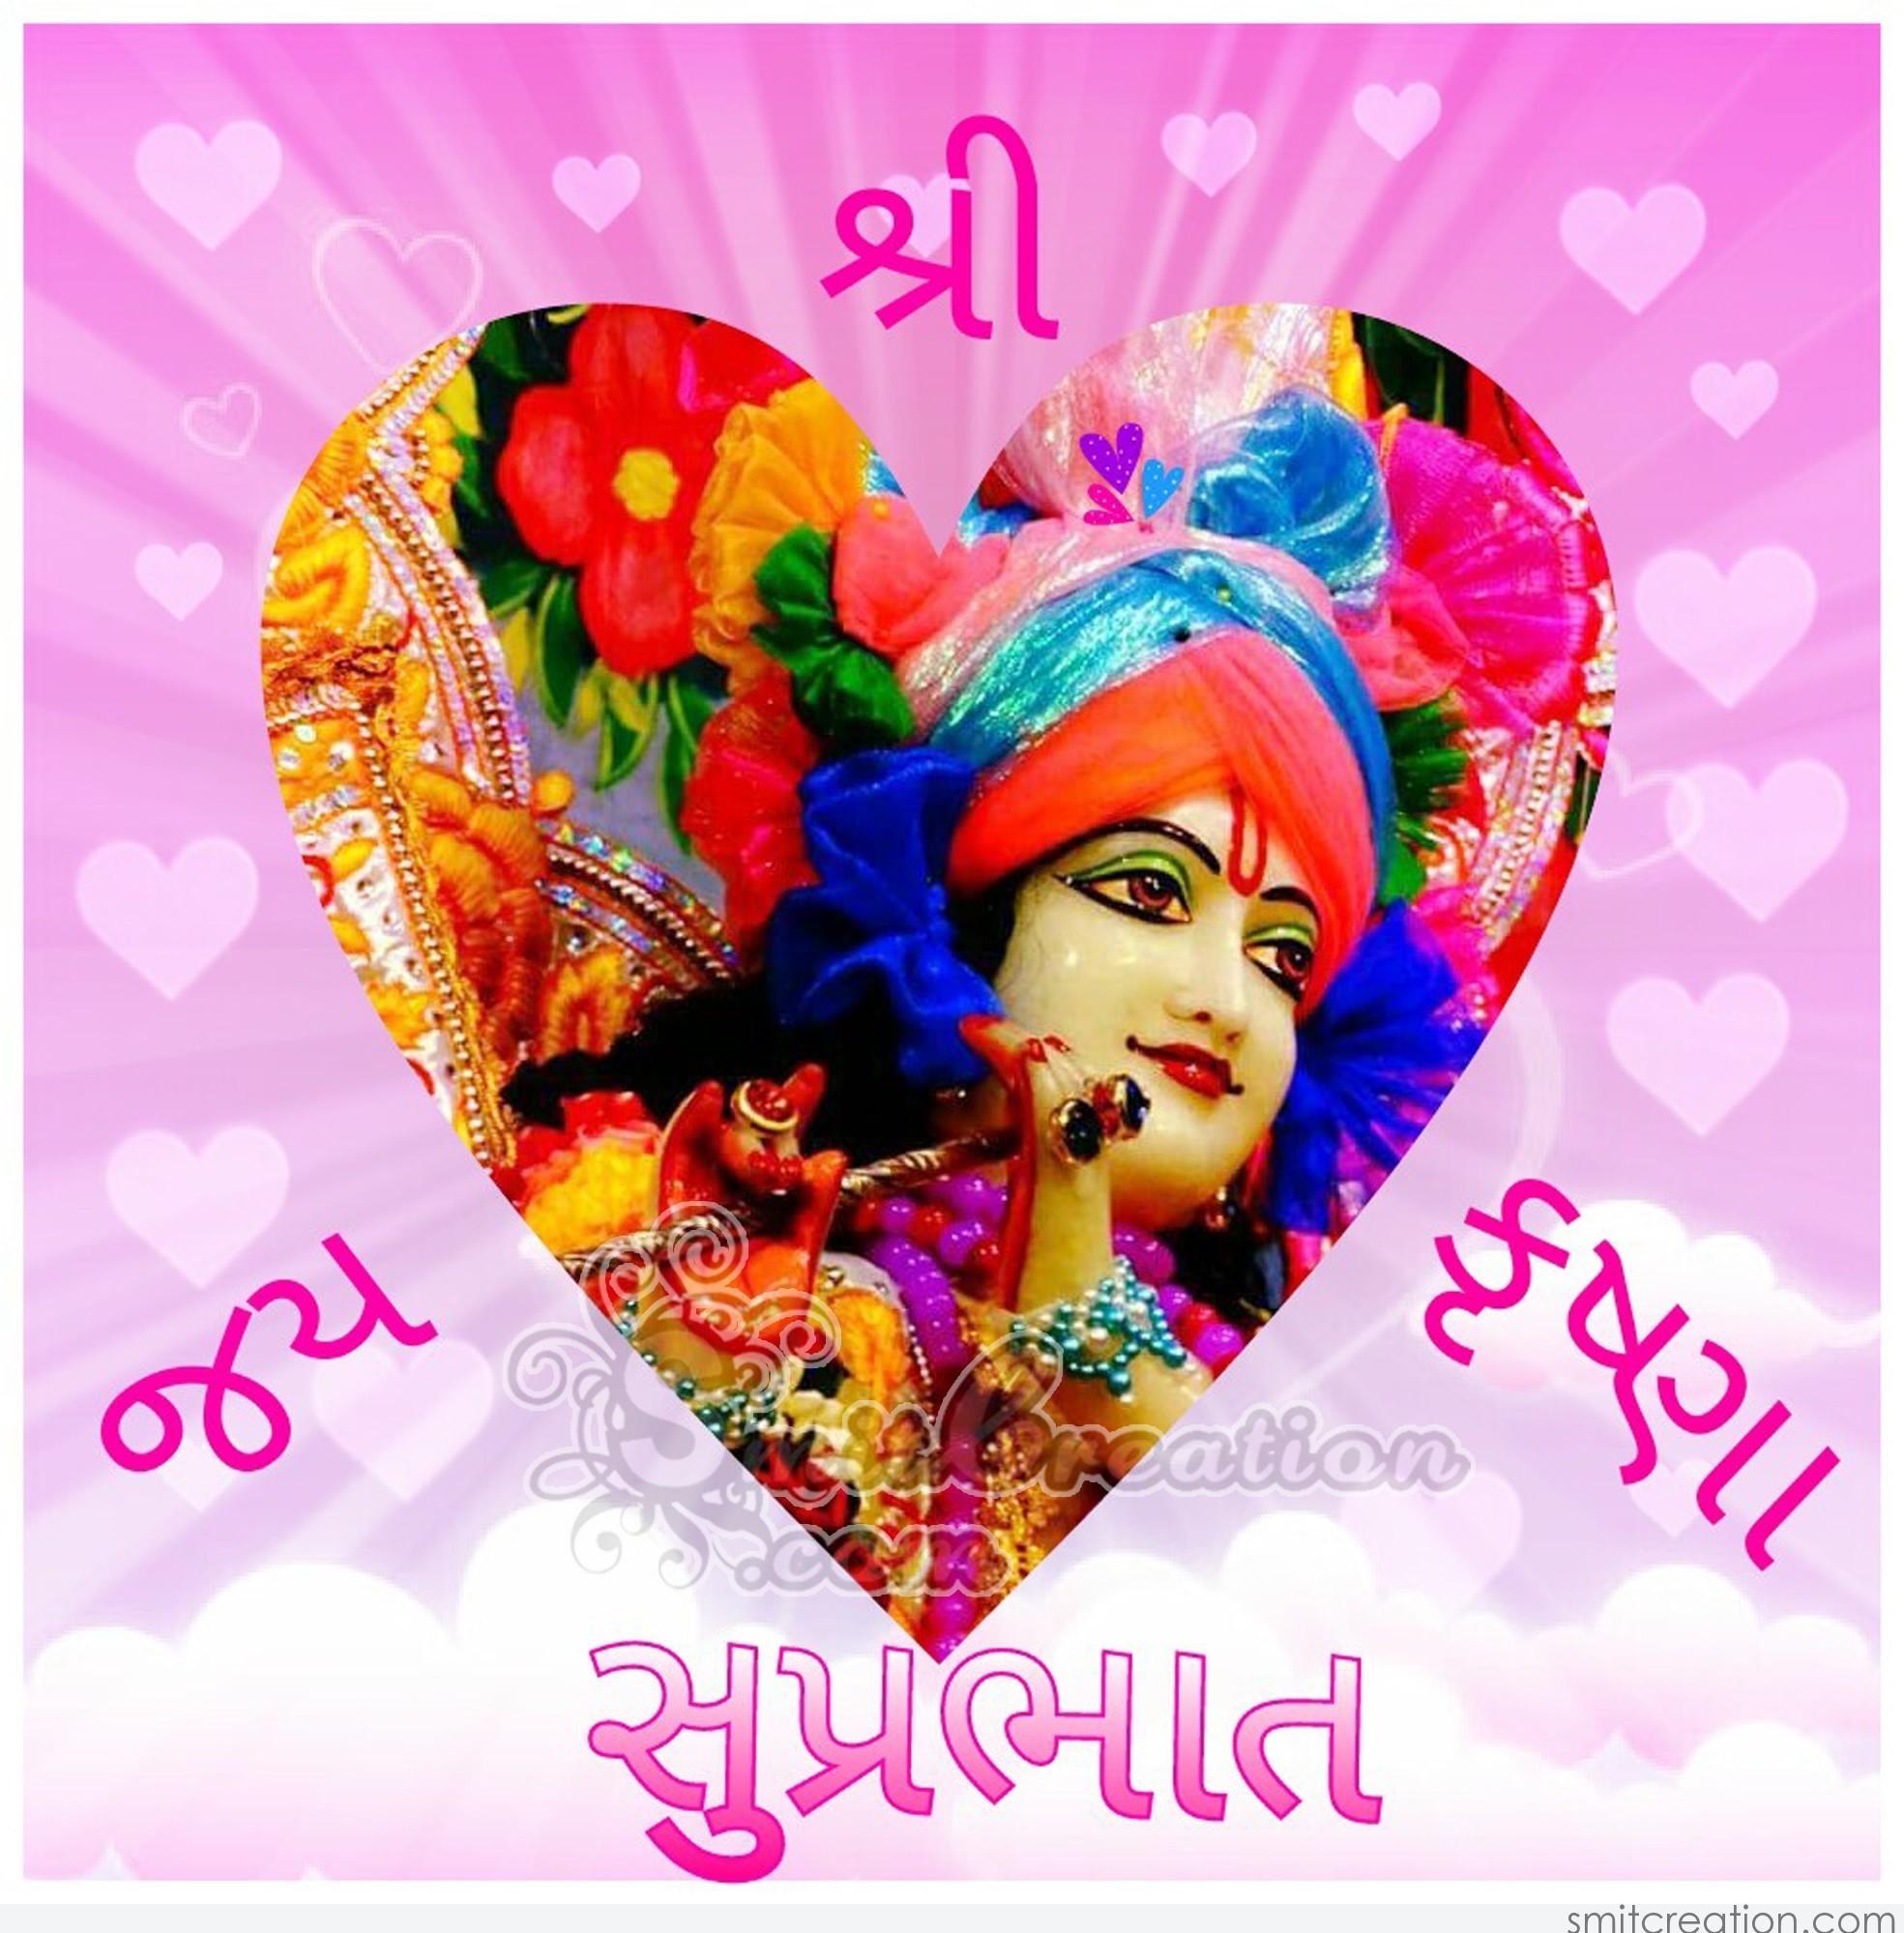 Suprabhat _ Jai Shri Krishna - SmitCreation.com